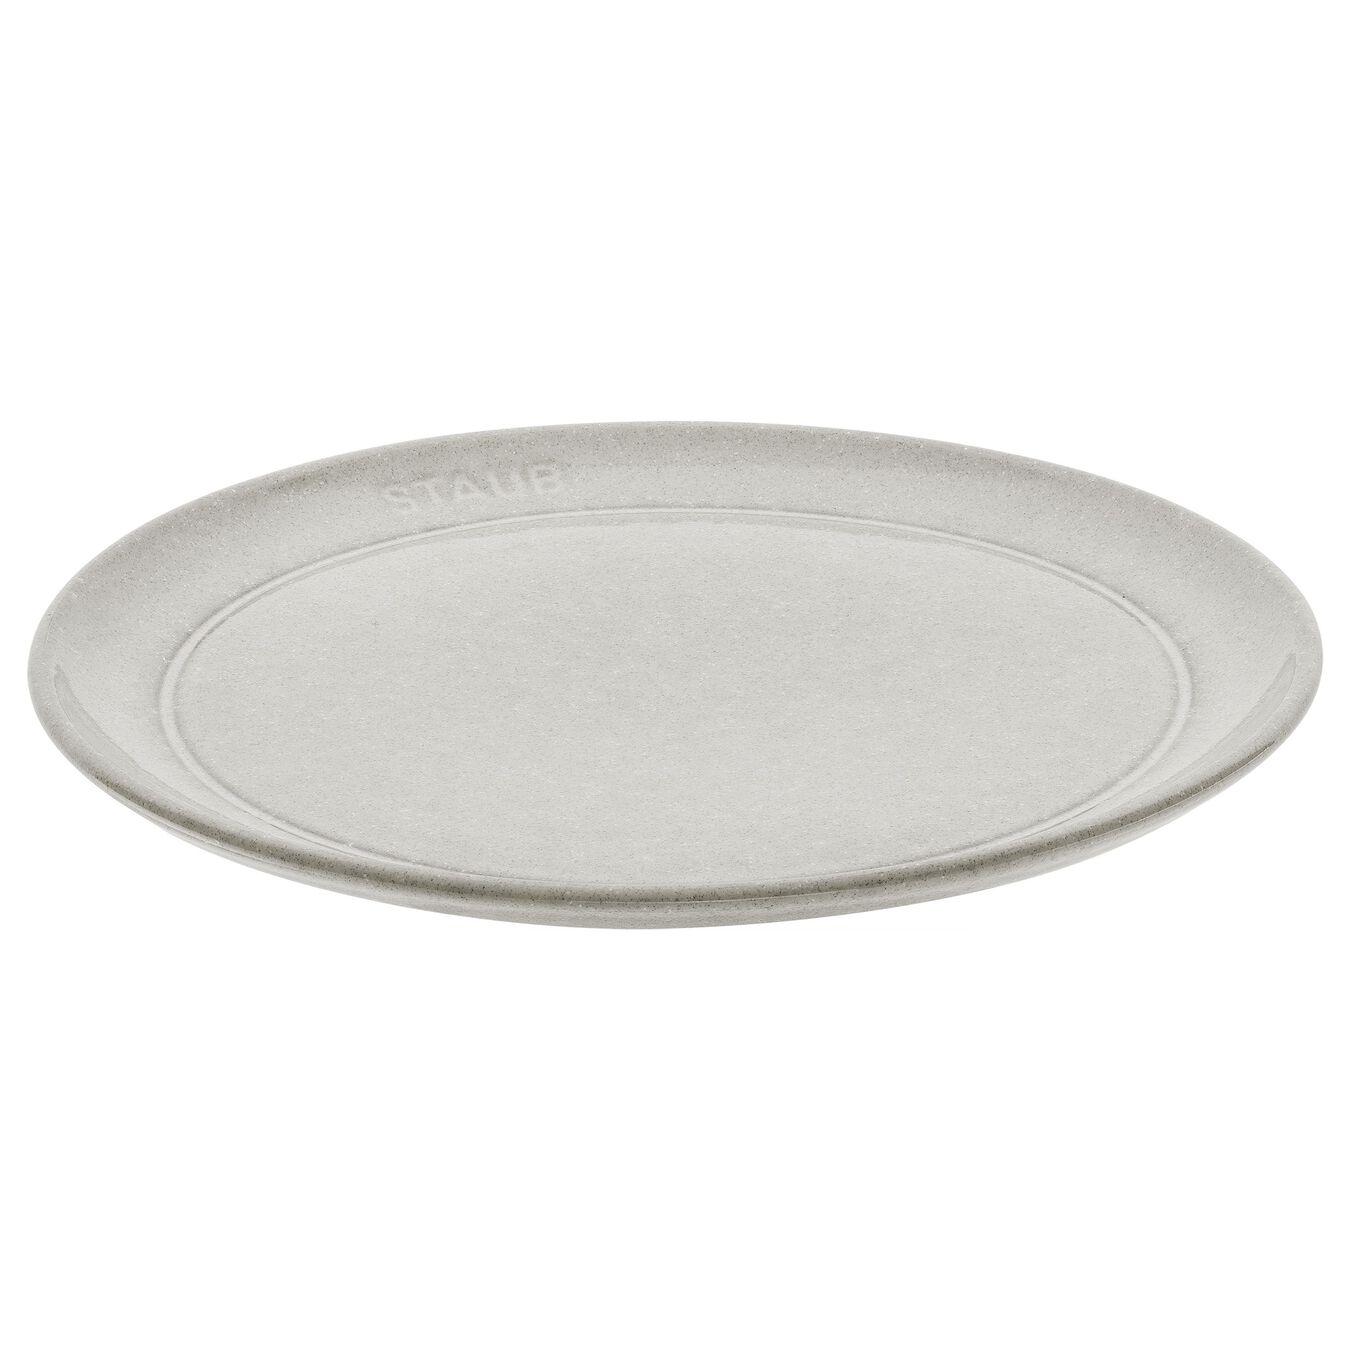 Pasta plate set, 4 Piece | white truffle | ceramic,,large 2